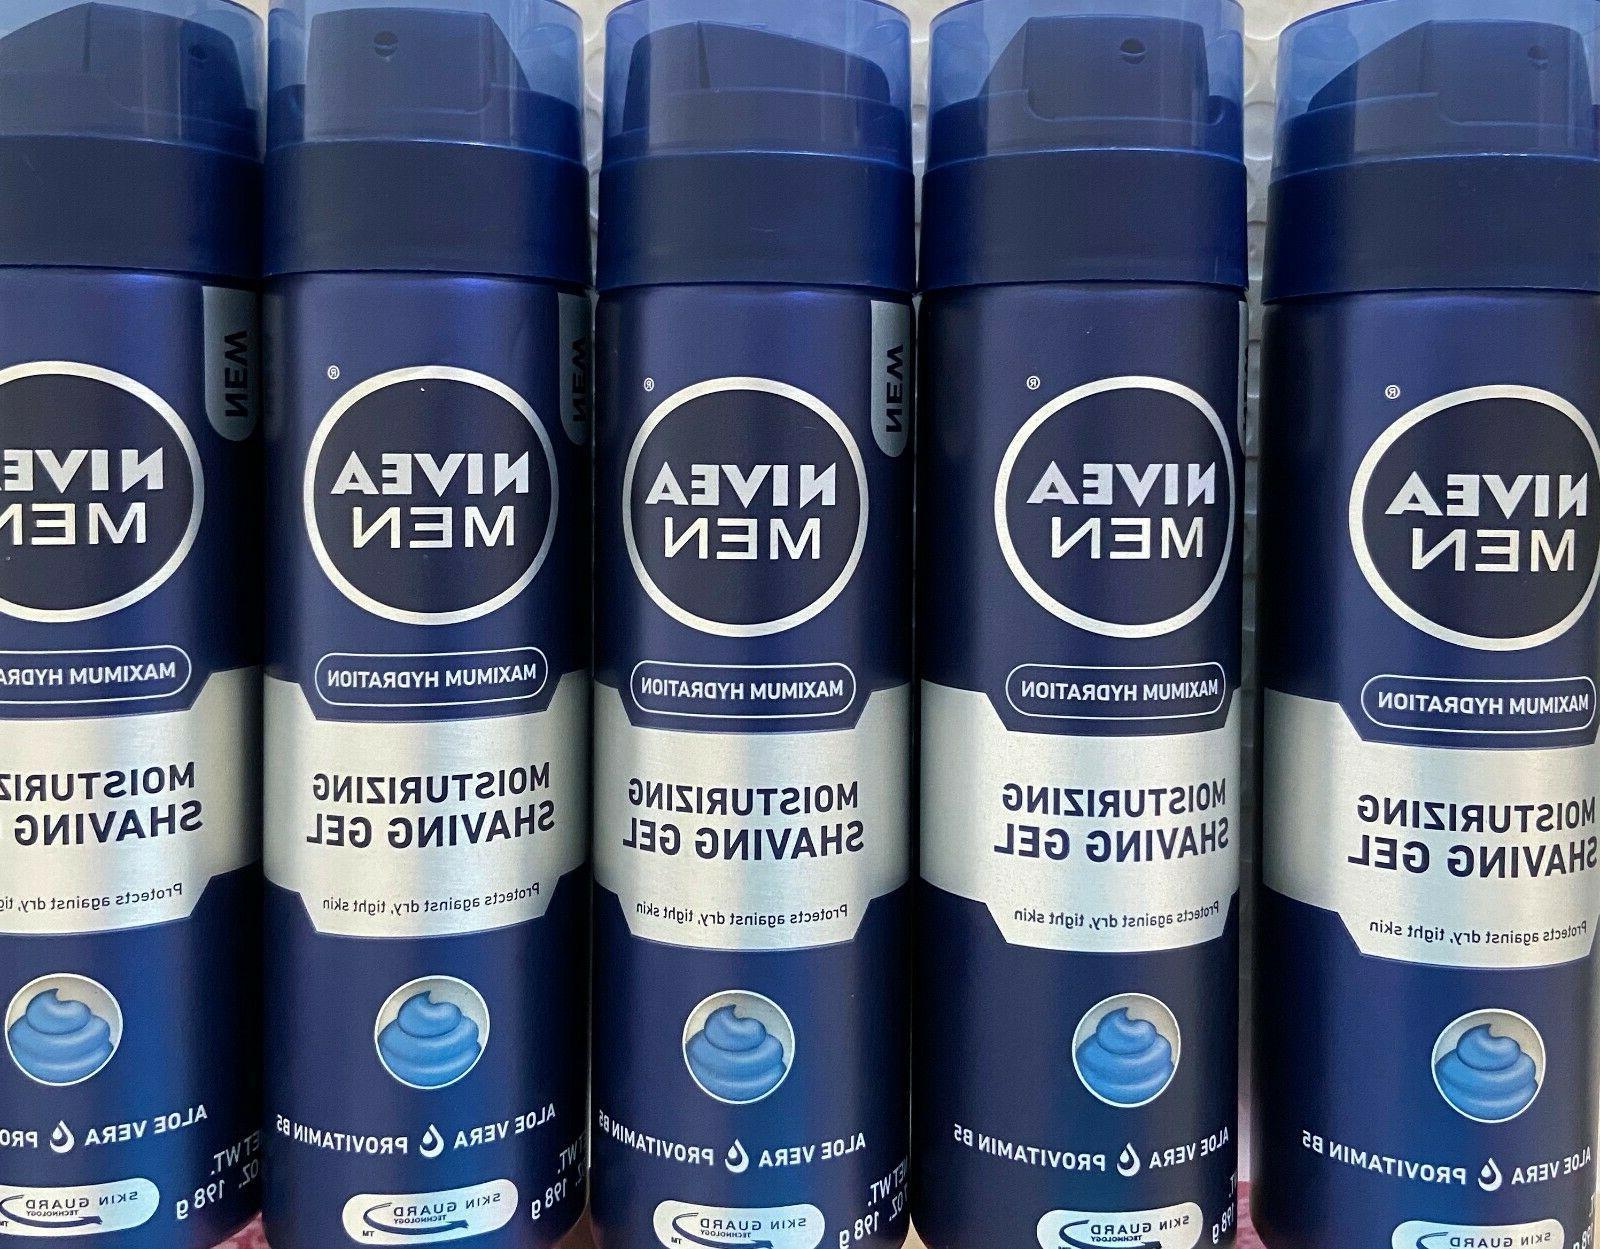 NIVEA Men Maximum Hydration Moisturizing Shaving Gel 7 Ounce